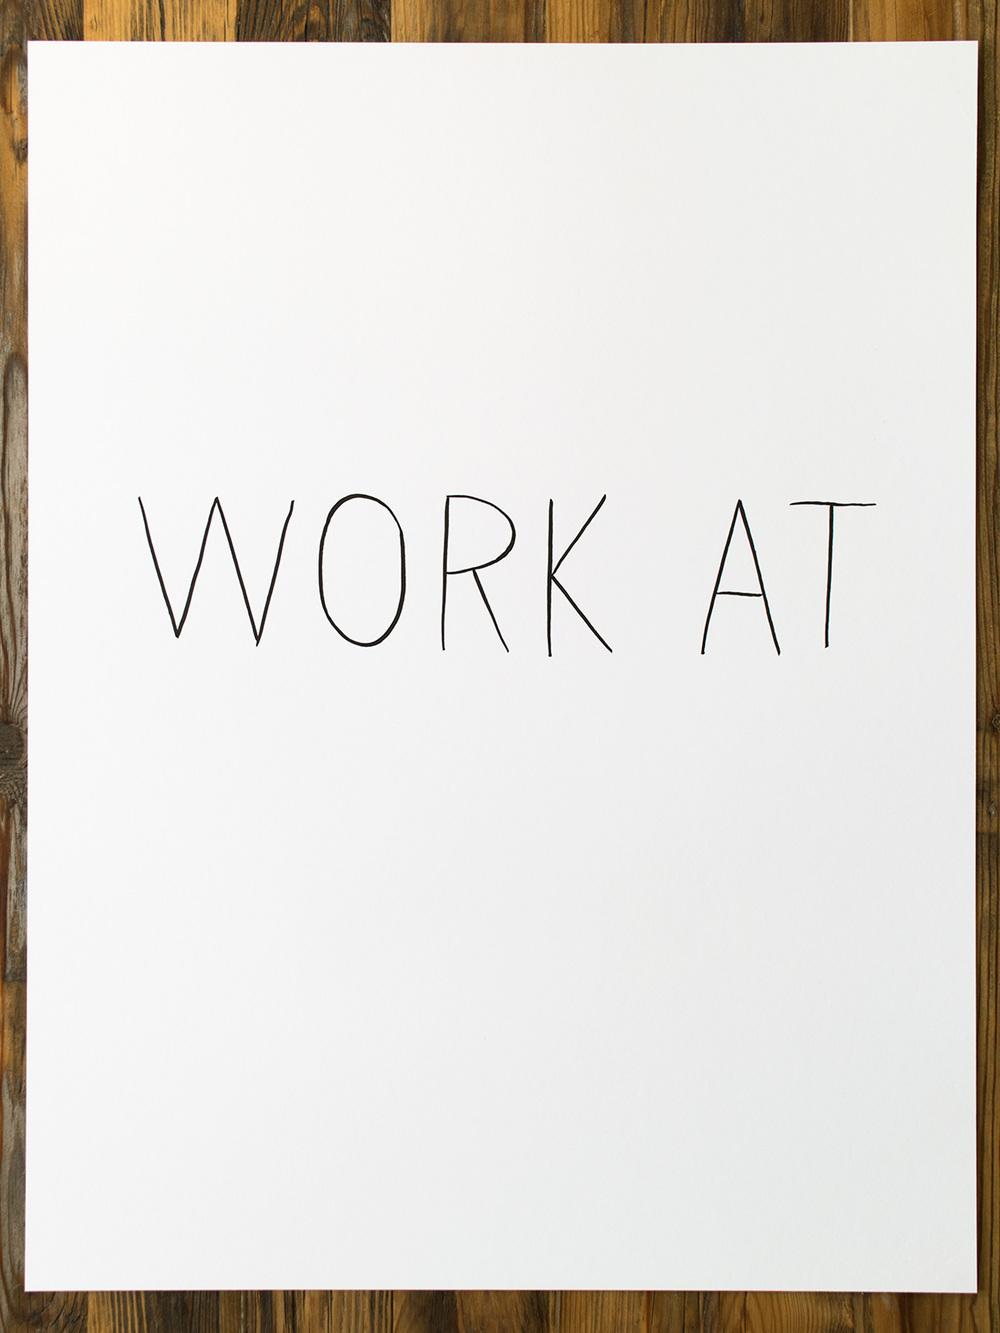 work_at-1500x1125.jpg